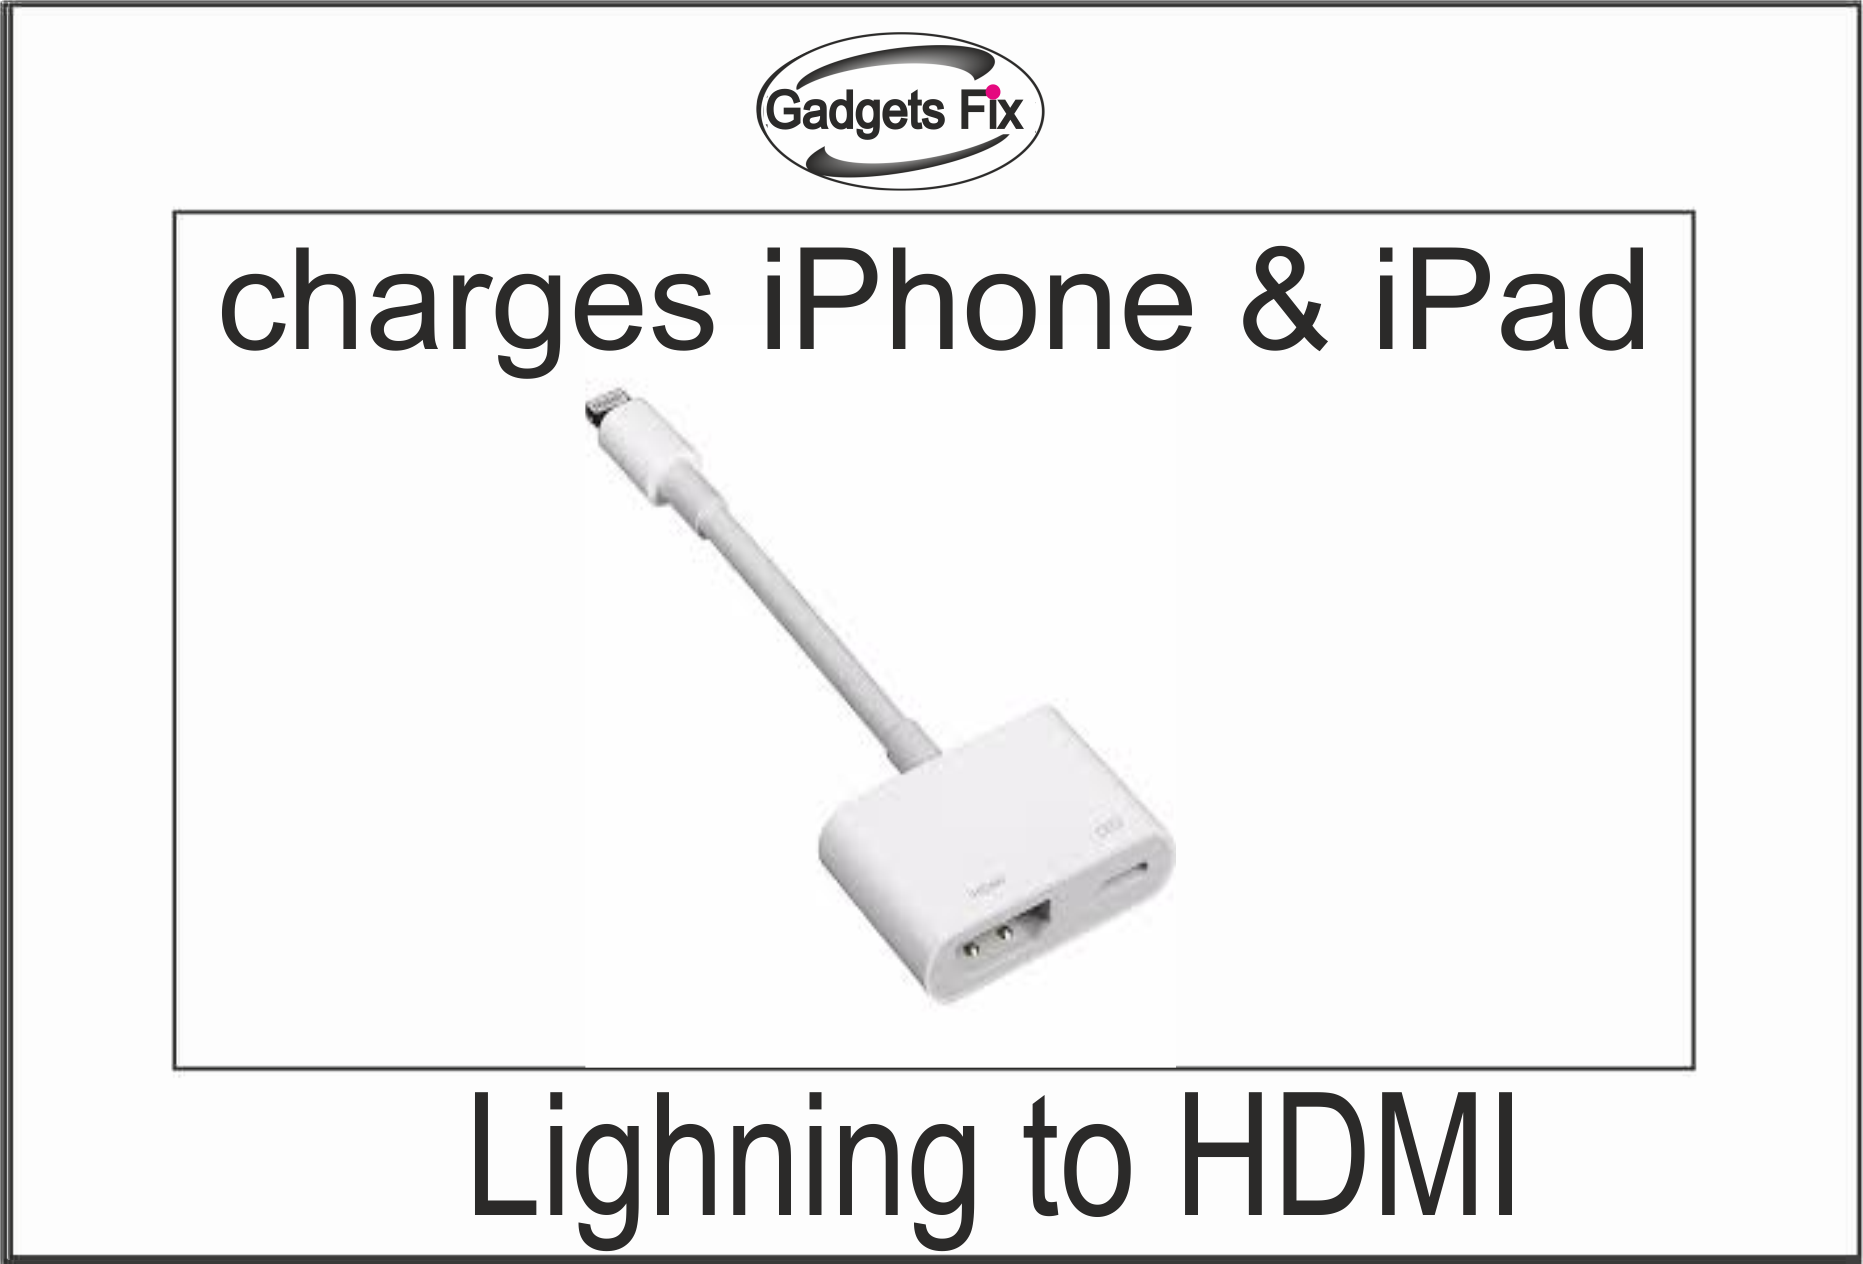 Lightning to HDMI